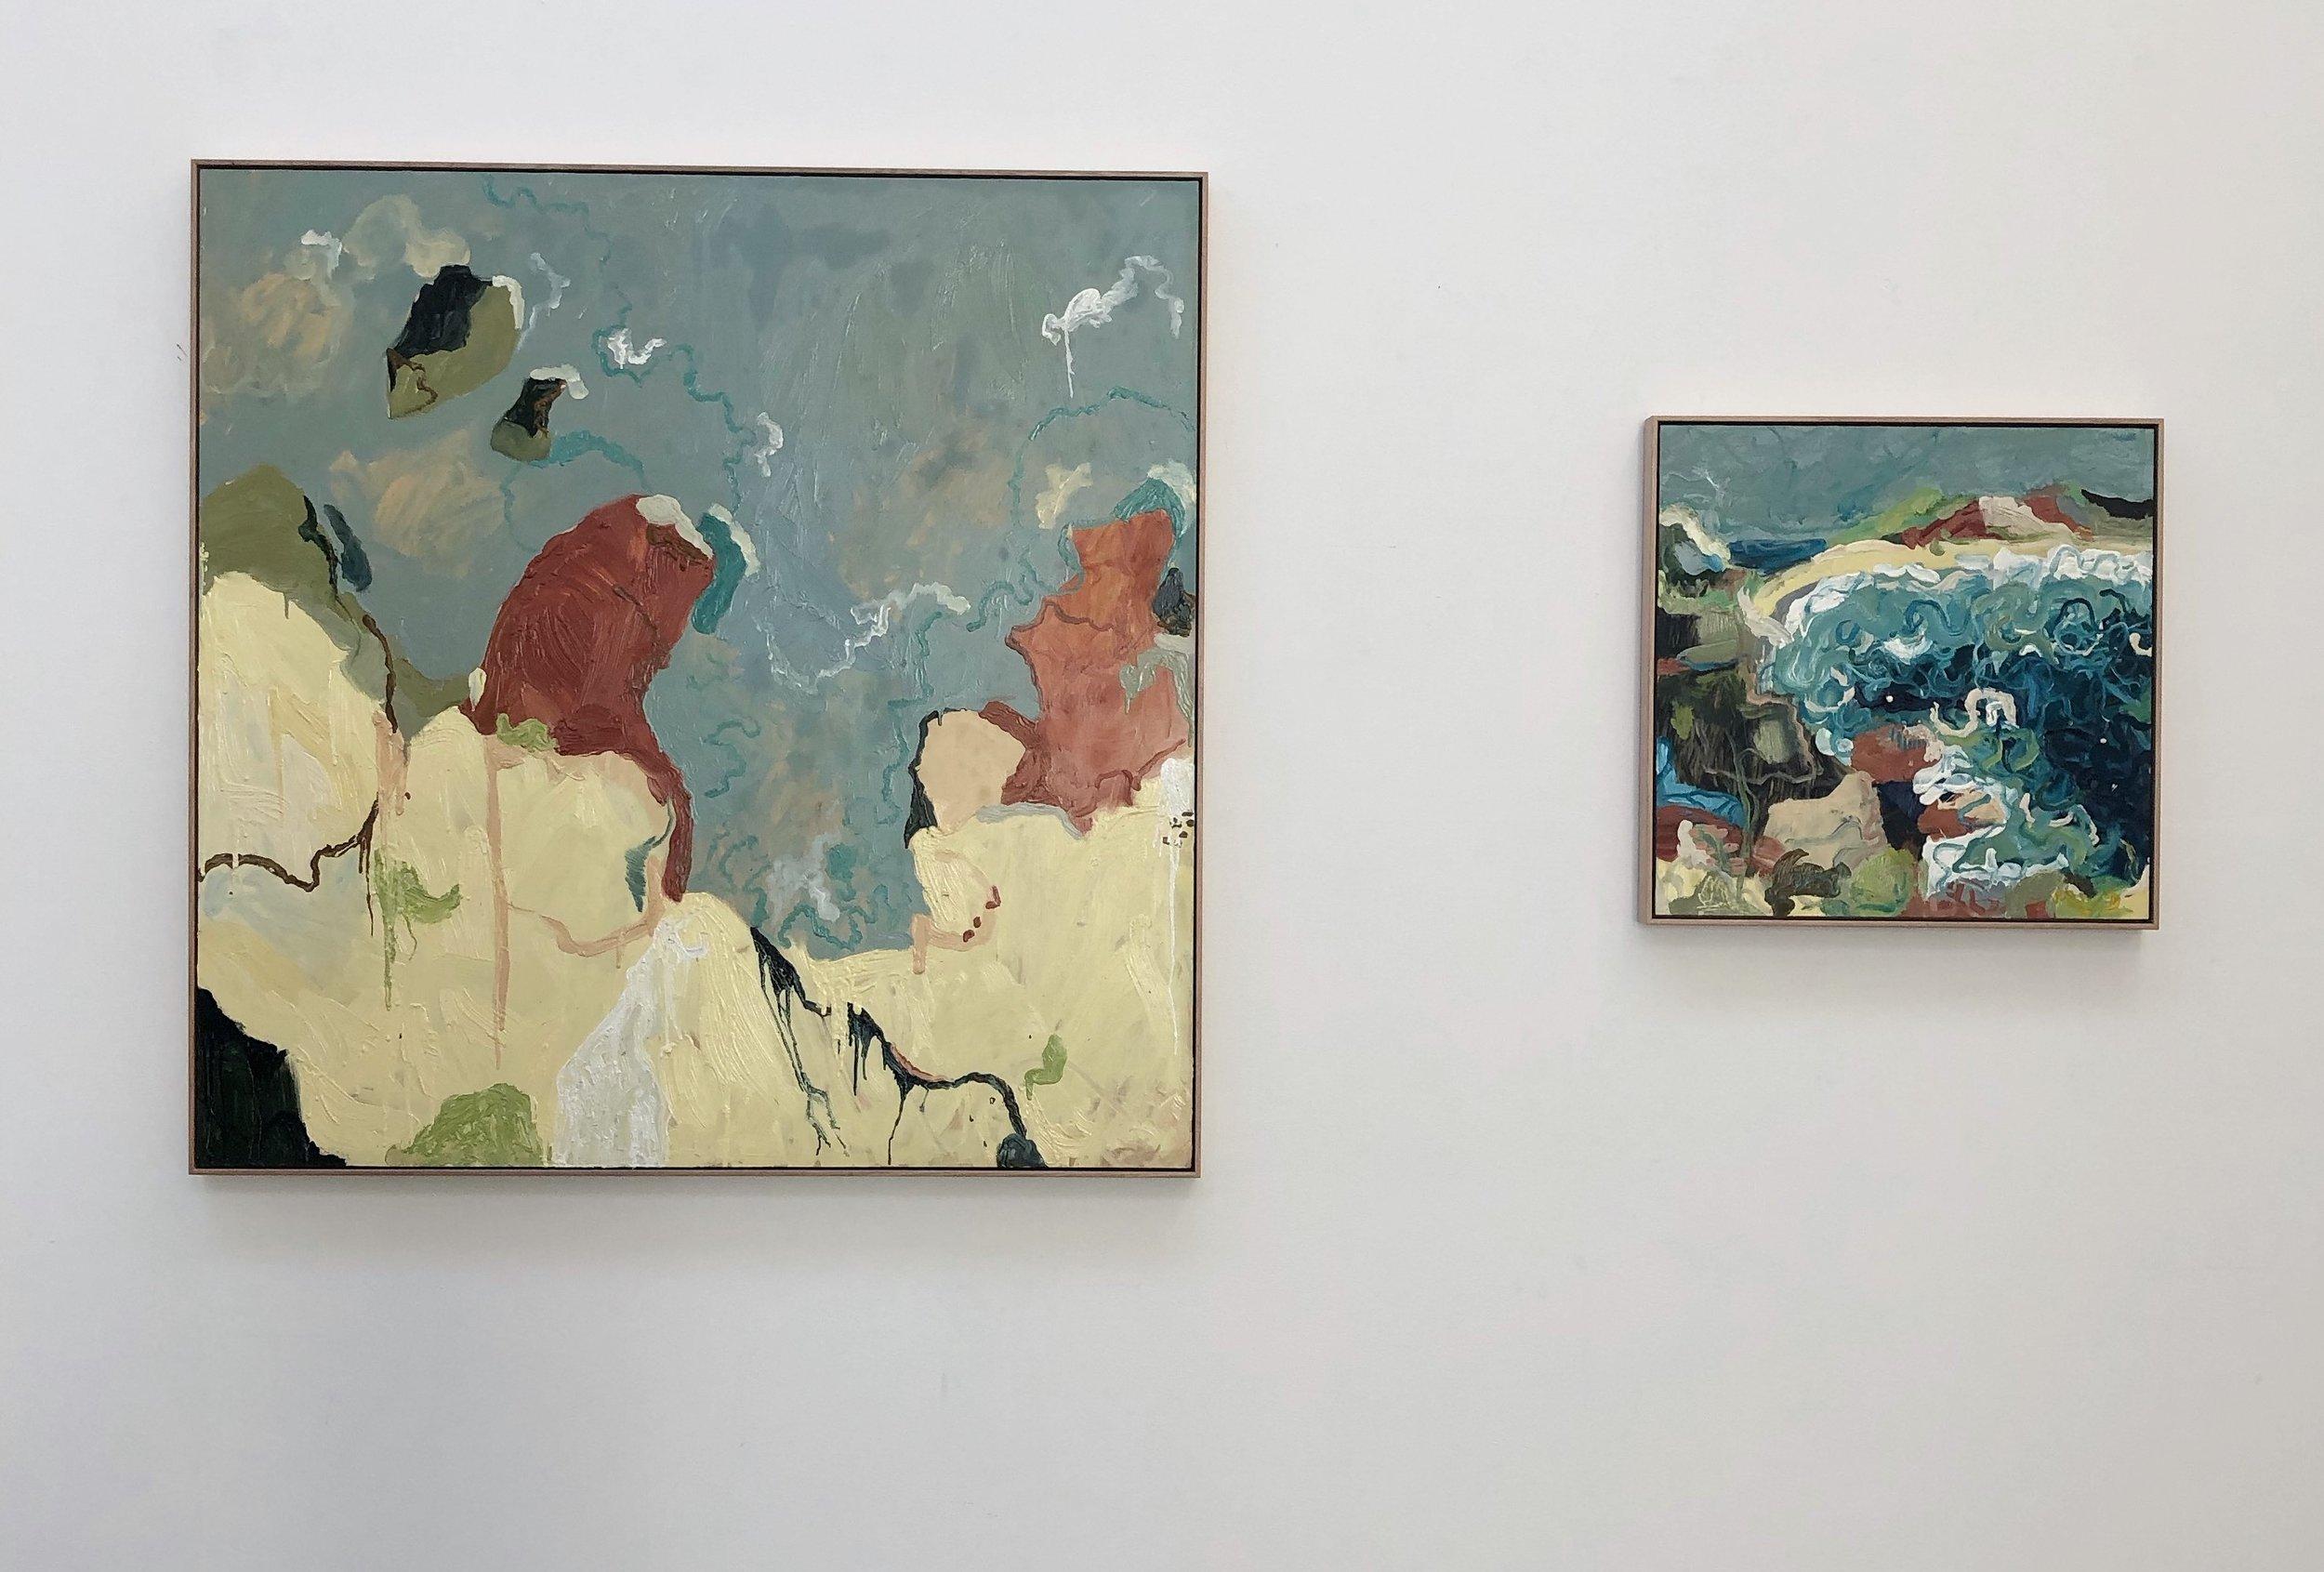 Michelle Teear install